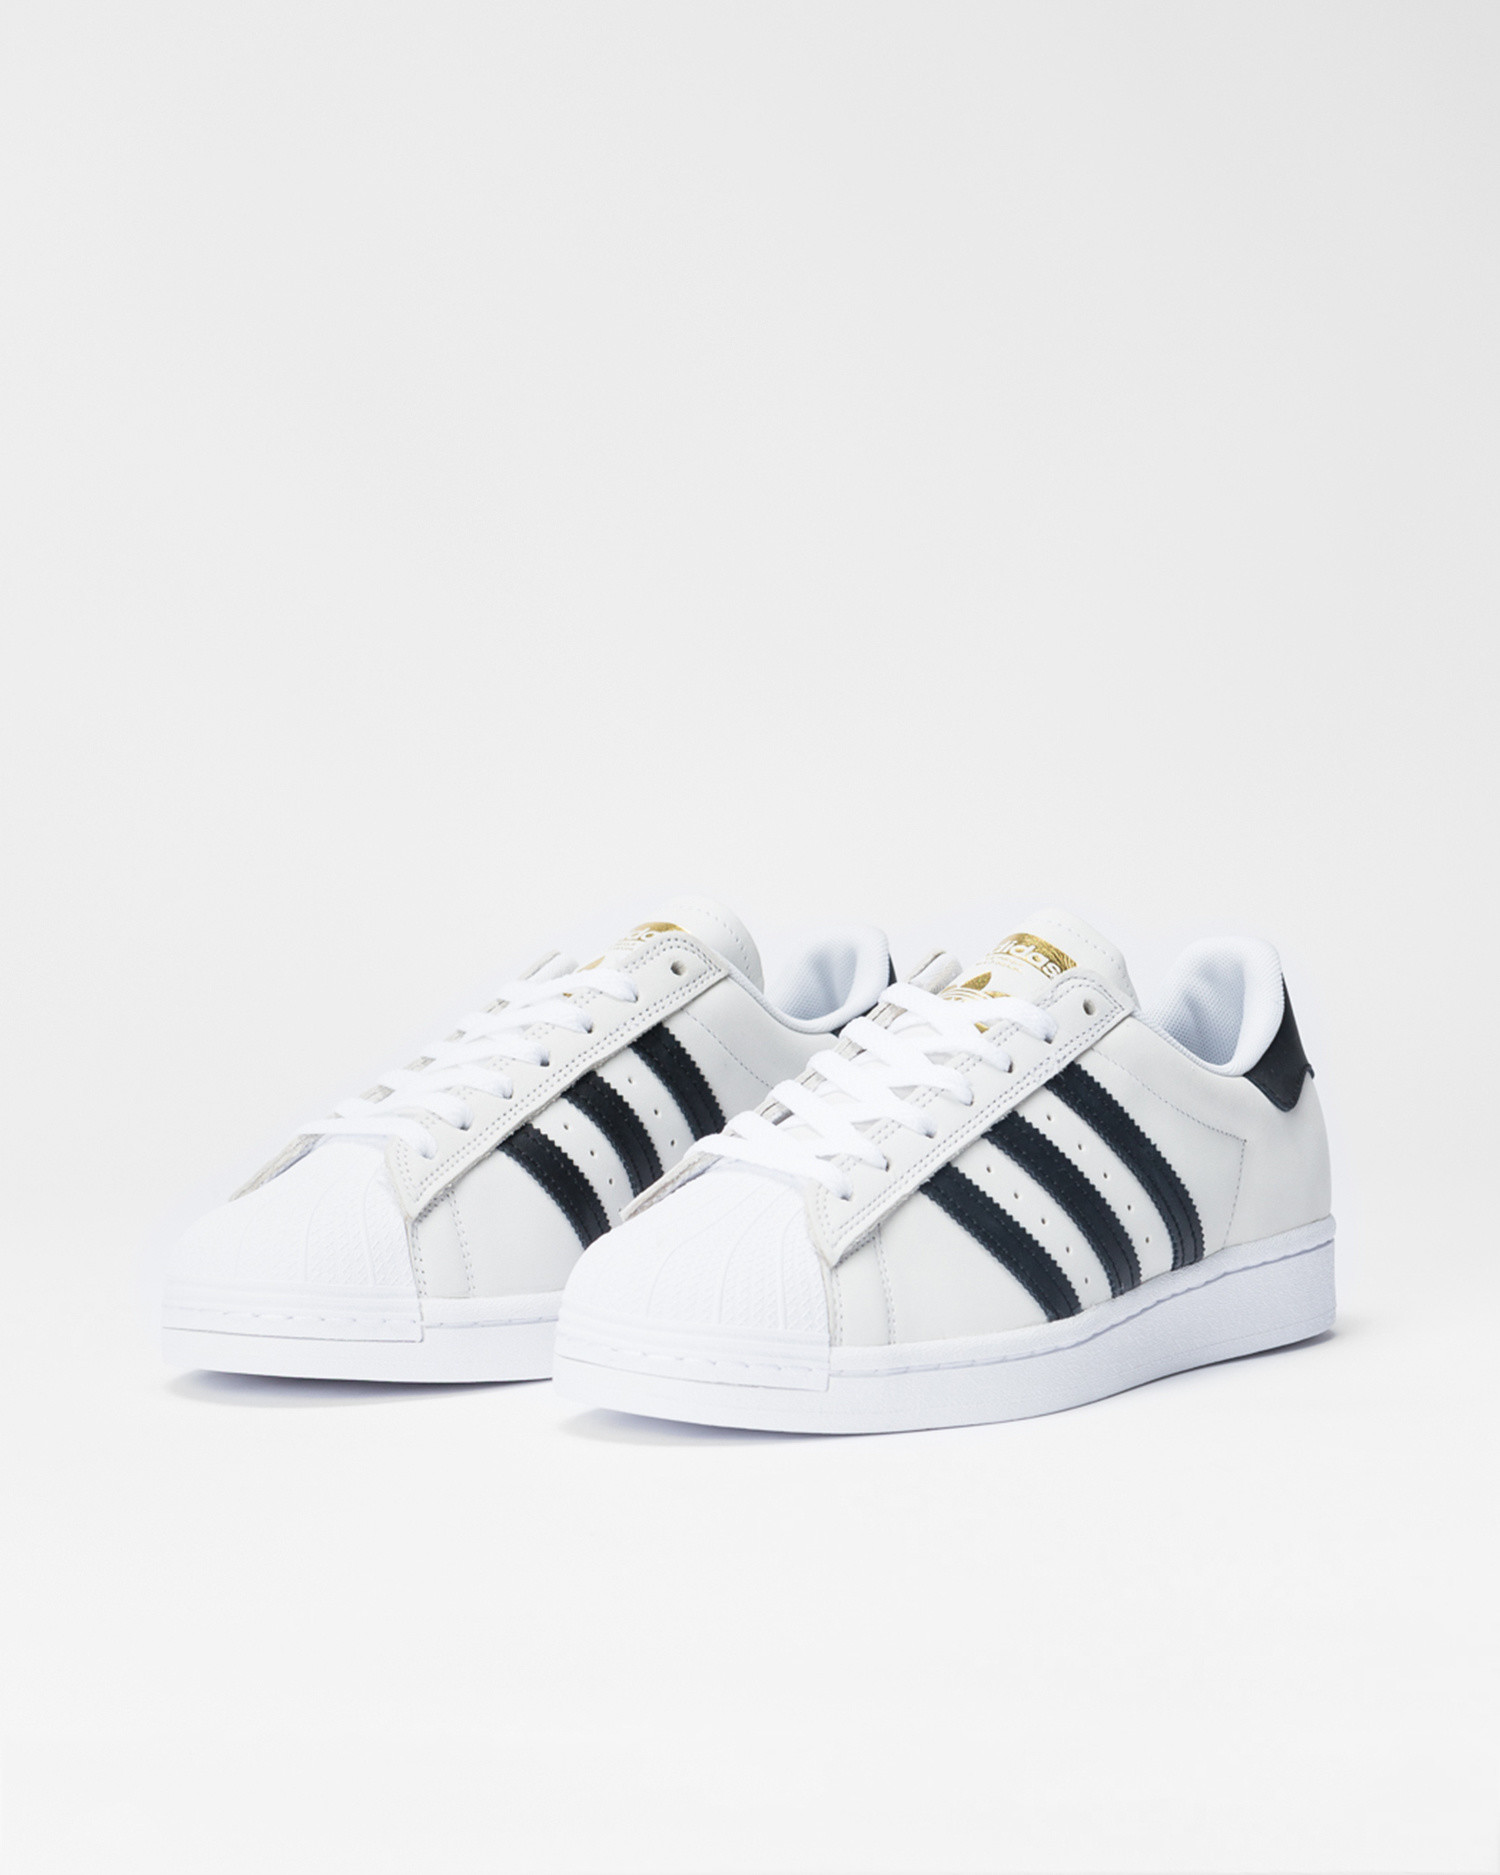 Adidas Superstar ADV Core Cloud White/Core Black/Gold Metallic